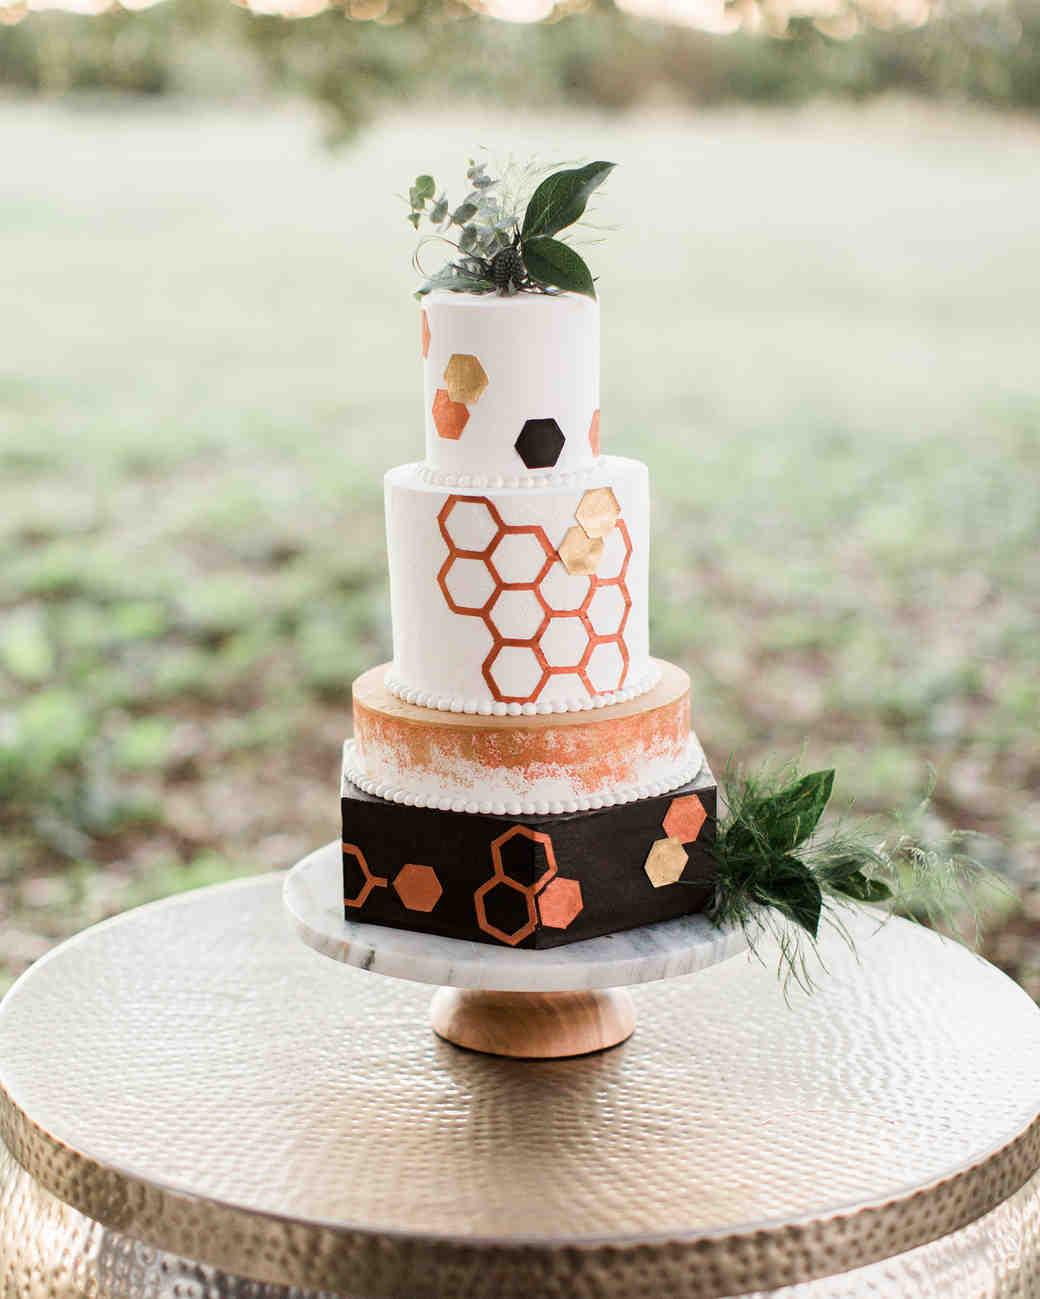 Honeycomb Wedding Inspiration, Wedding Cake with Honeycomb Foil Details